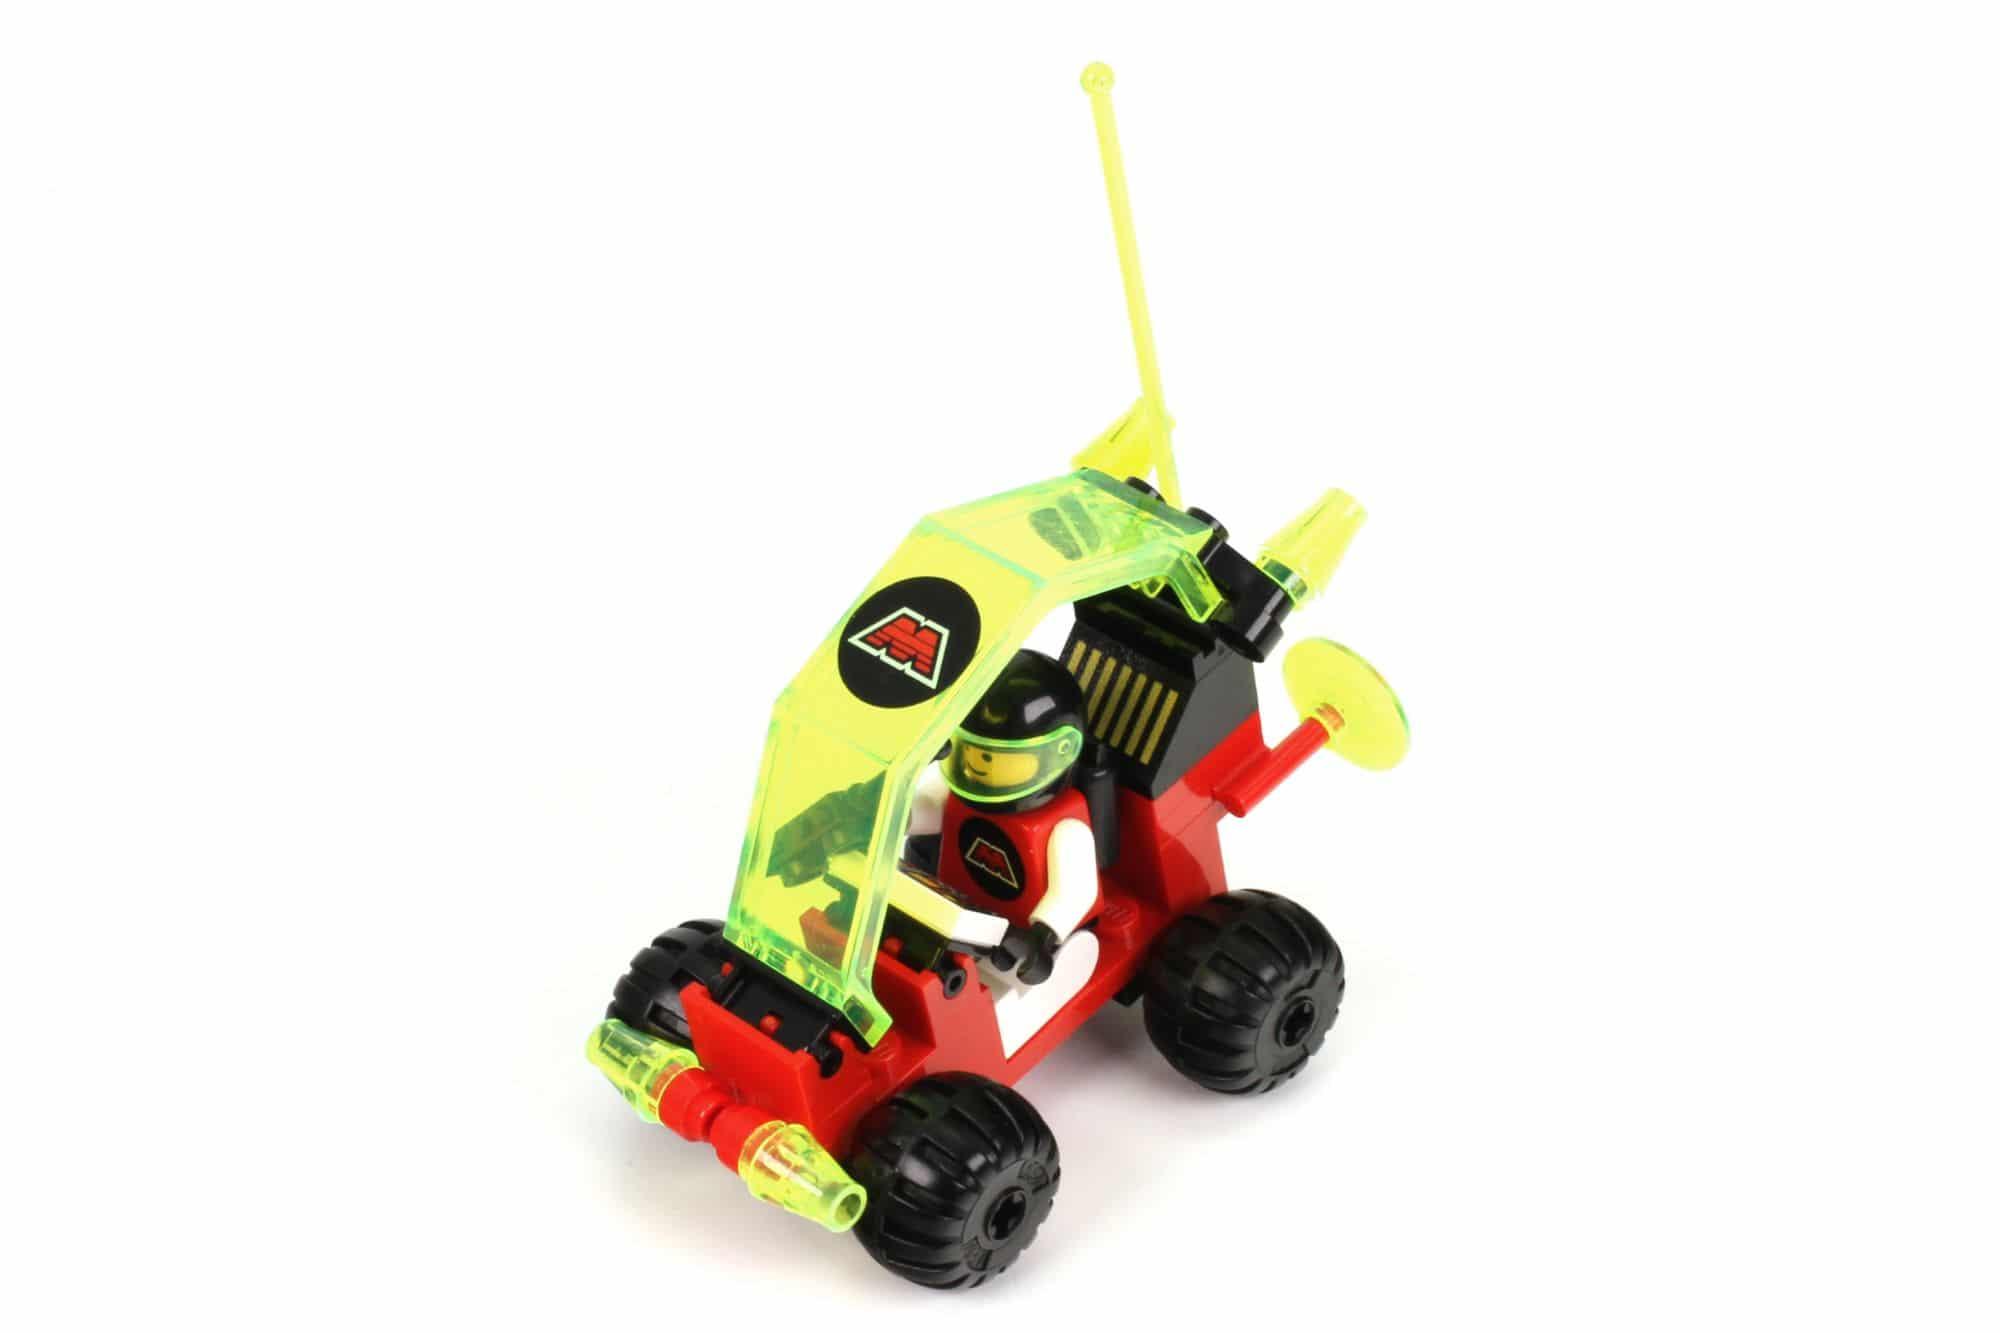 LEGO 6833 M Tron Beacon Tracer 1